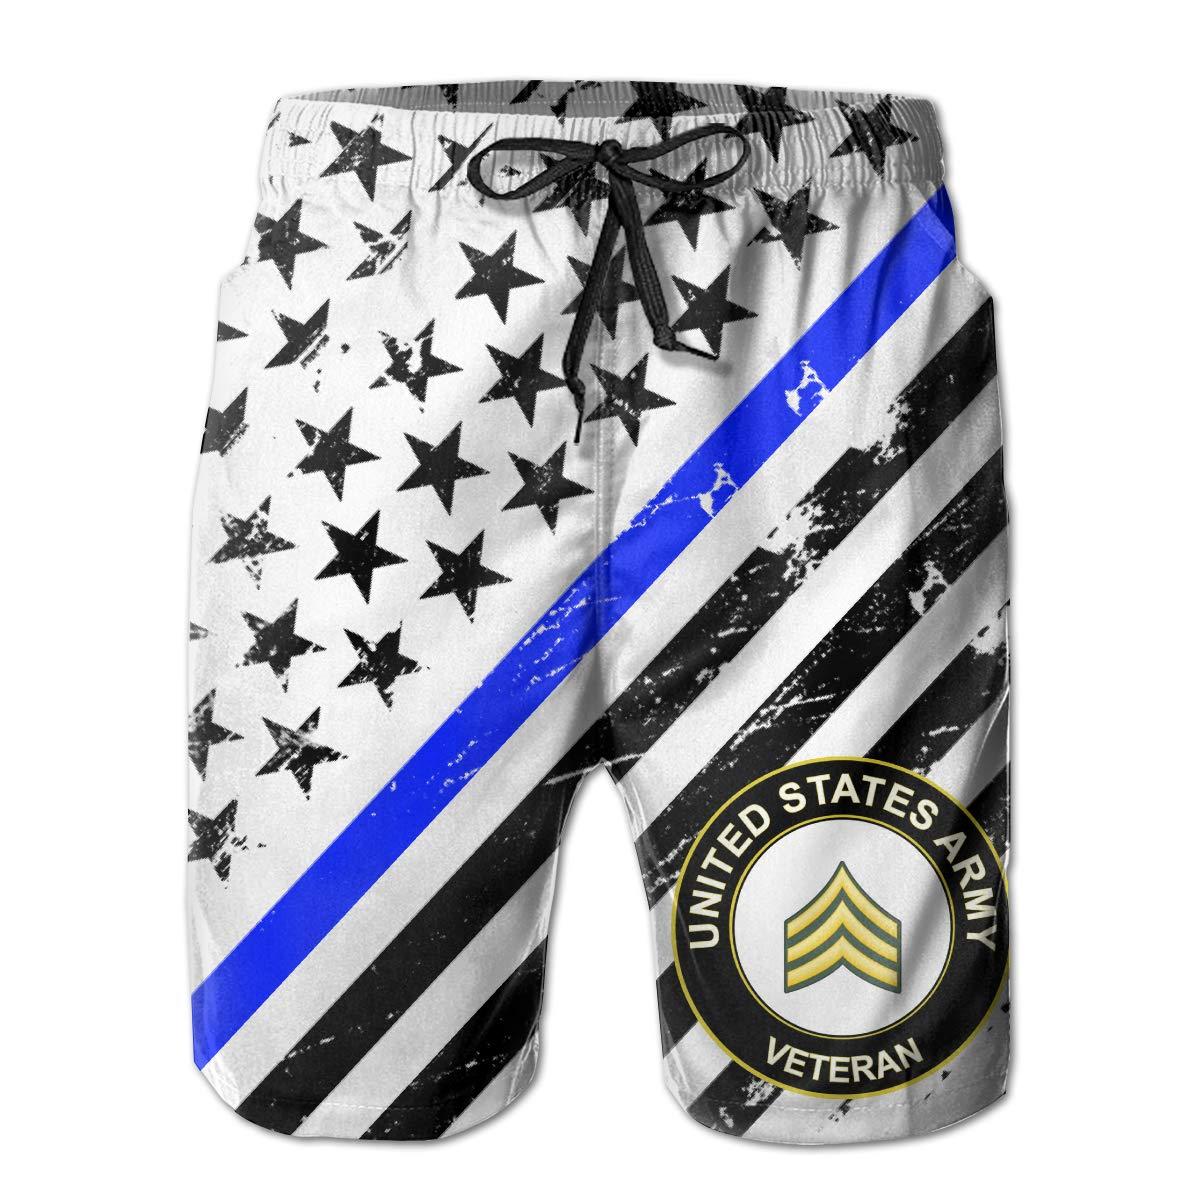 ThreeAlclo US Army Sergeant Veteran Summer Swim Trunks 3D Print Beach Board Shorts for Men